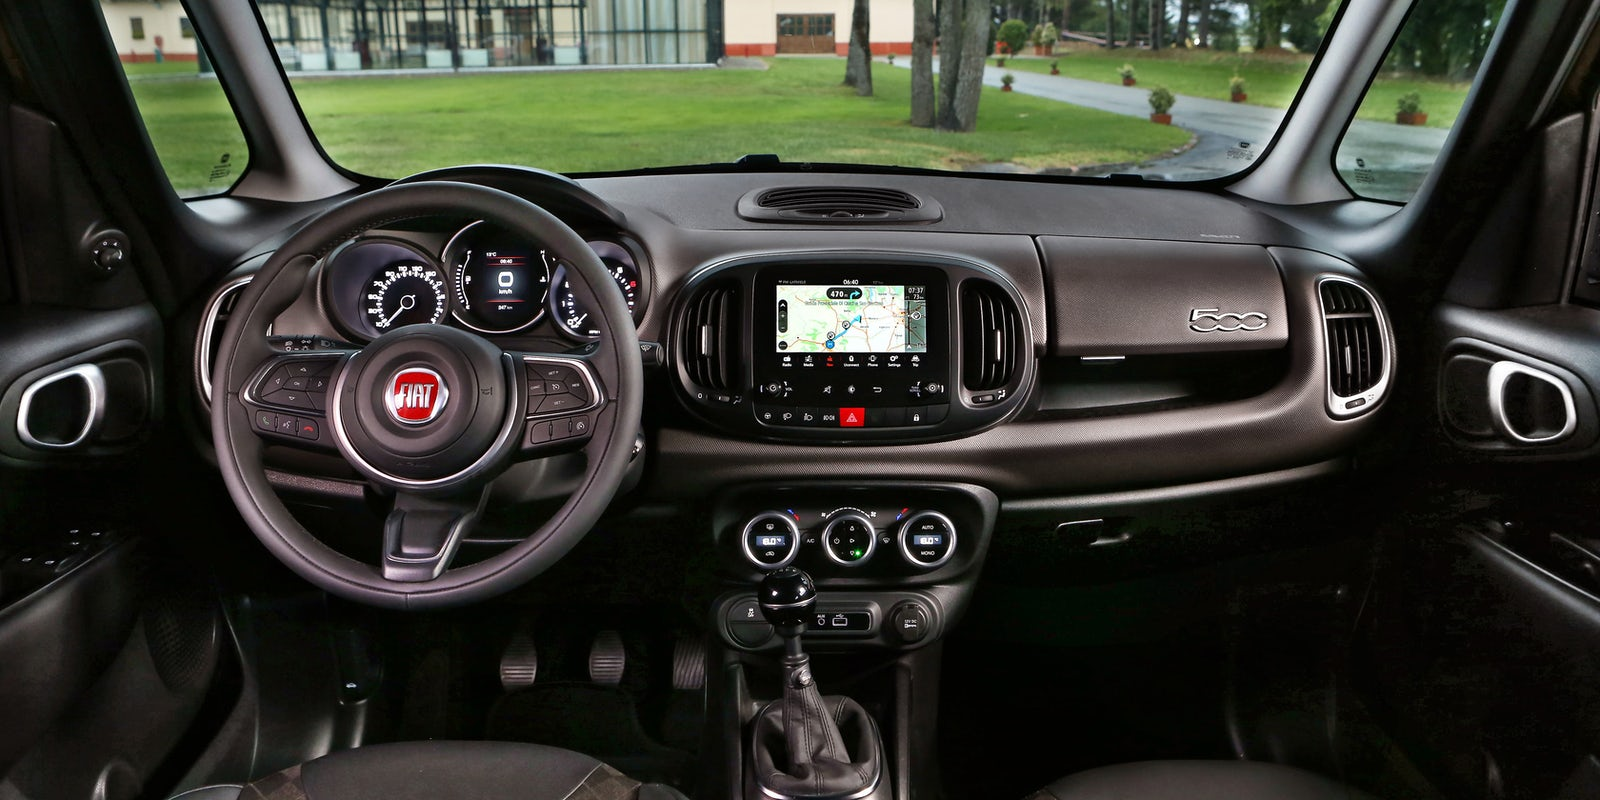 Fiat 500l Interior Amp Infotainment Carwow